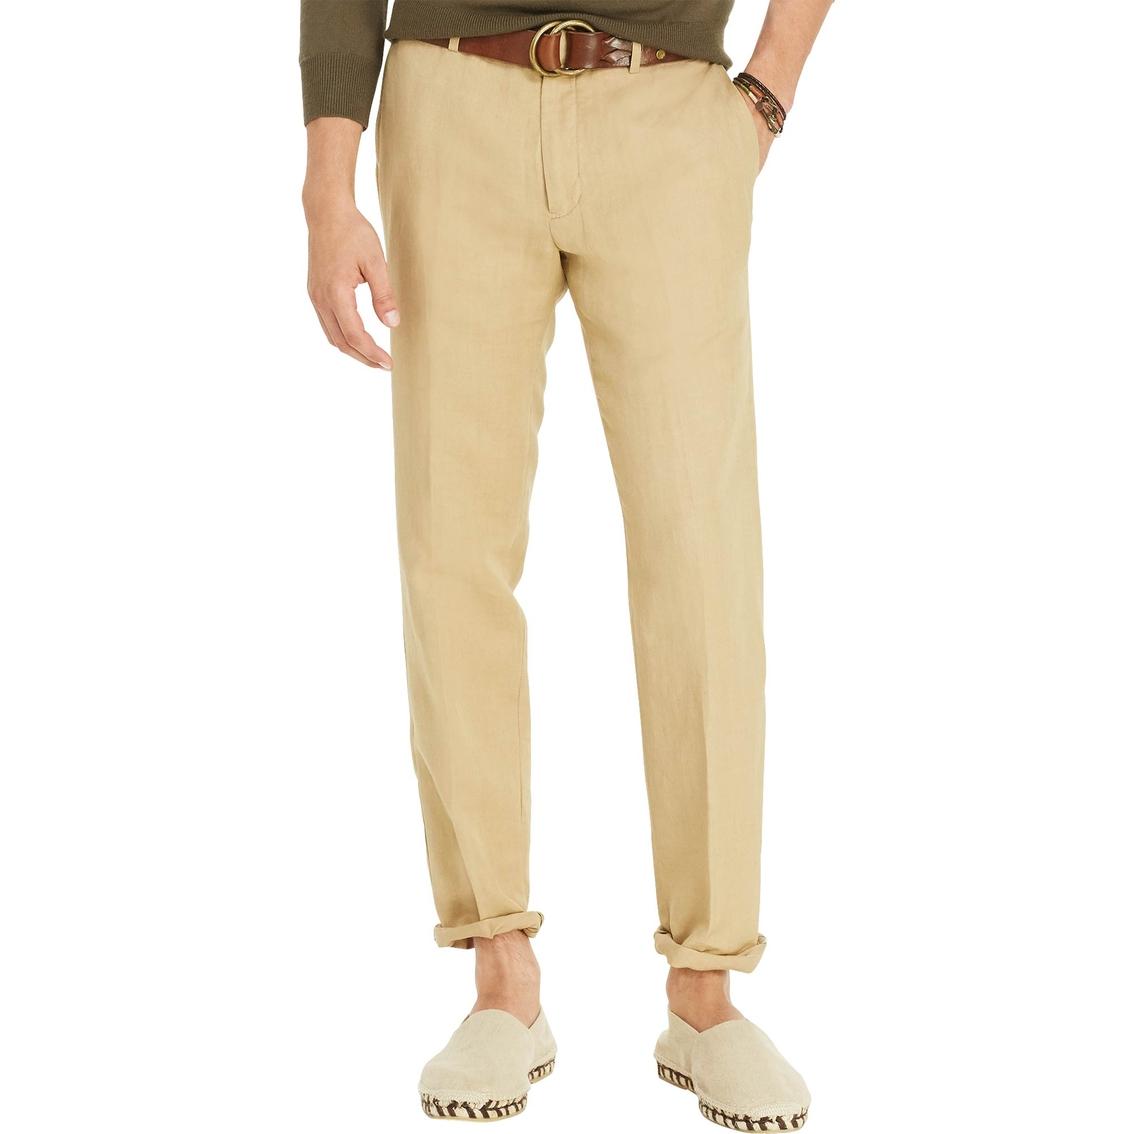 Pants Polo Chino Ralph Lauren Classic Fit Linen Blend mvN8n0wO